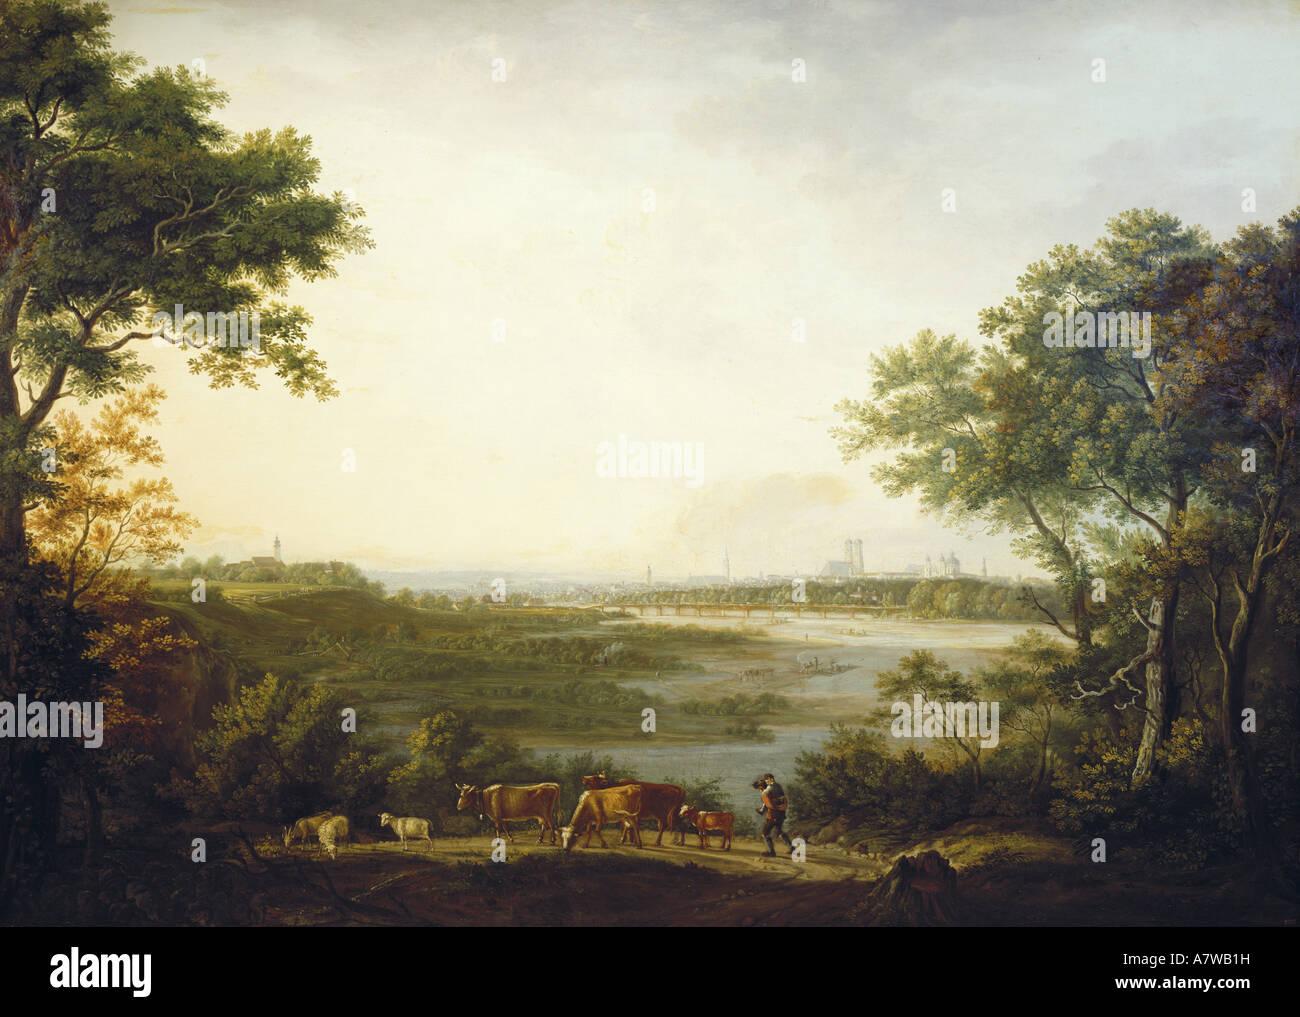 "Belle arti, Dorner, Johann Jakob, il sambuco (1766 - 1813), 'Ansicht von München"", pittura, 1806, olio su tela, Foto Stock"